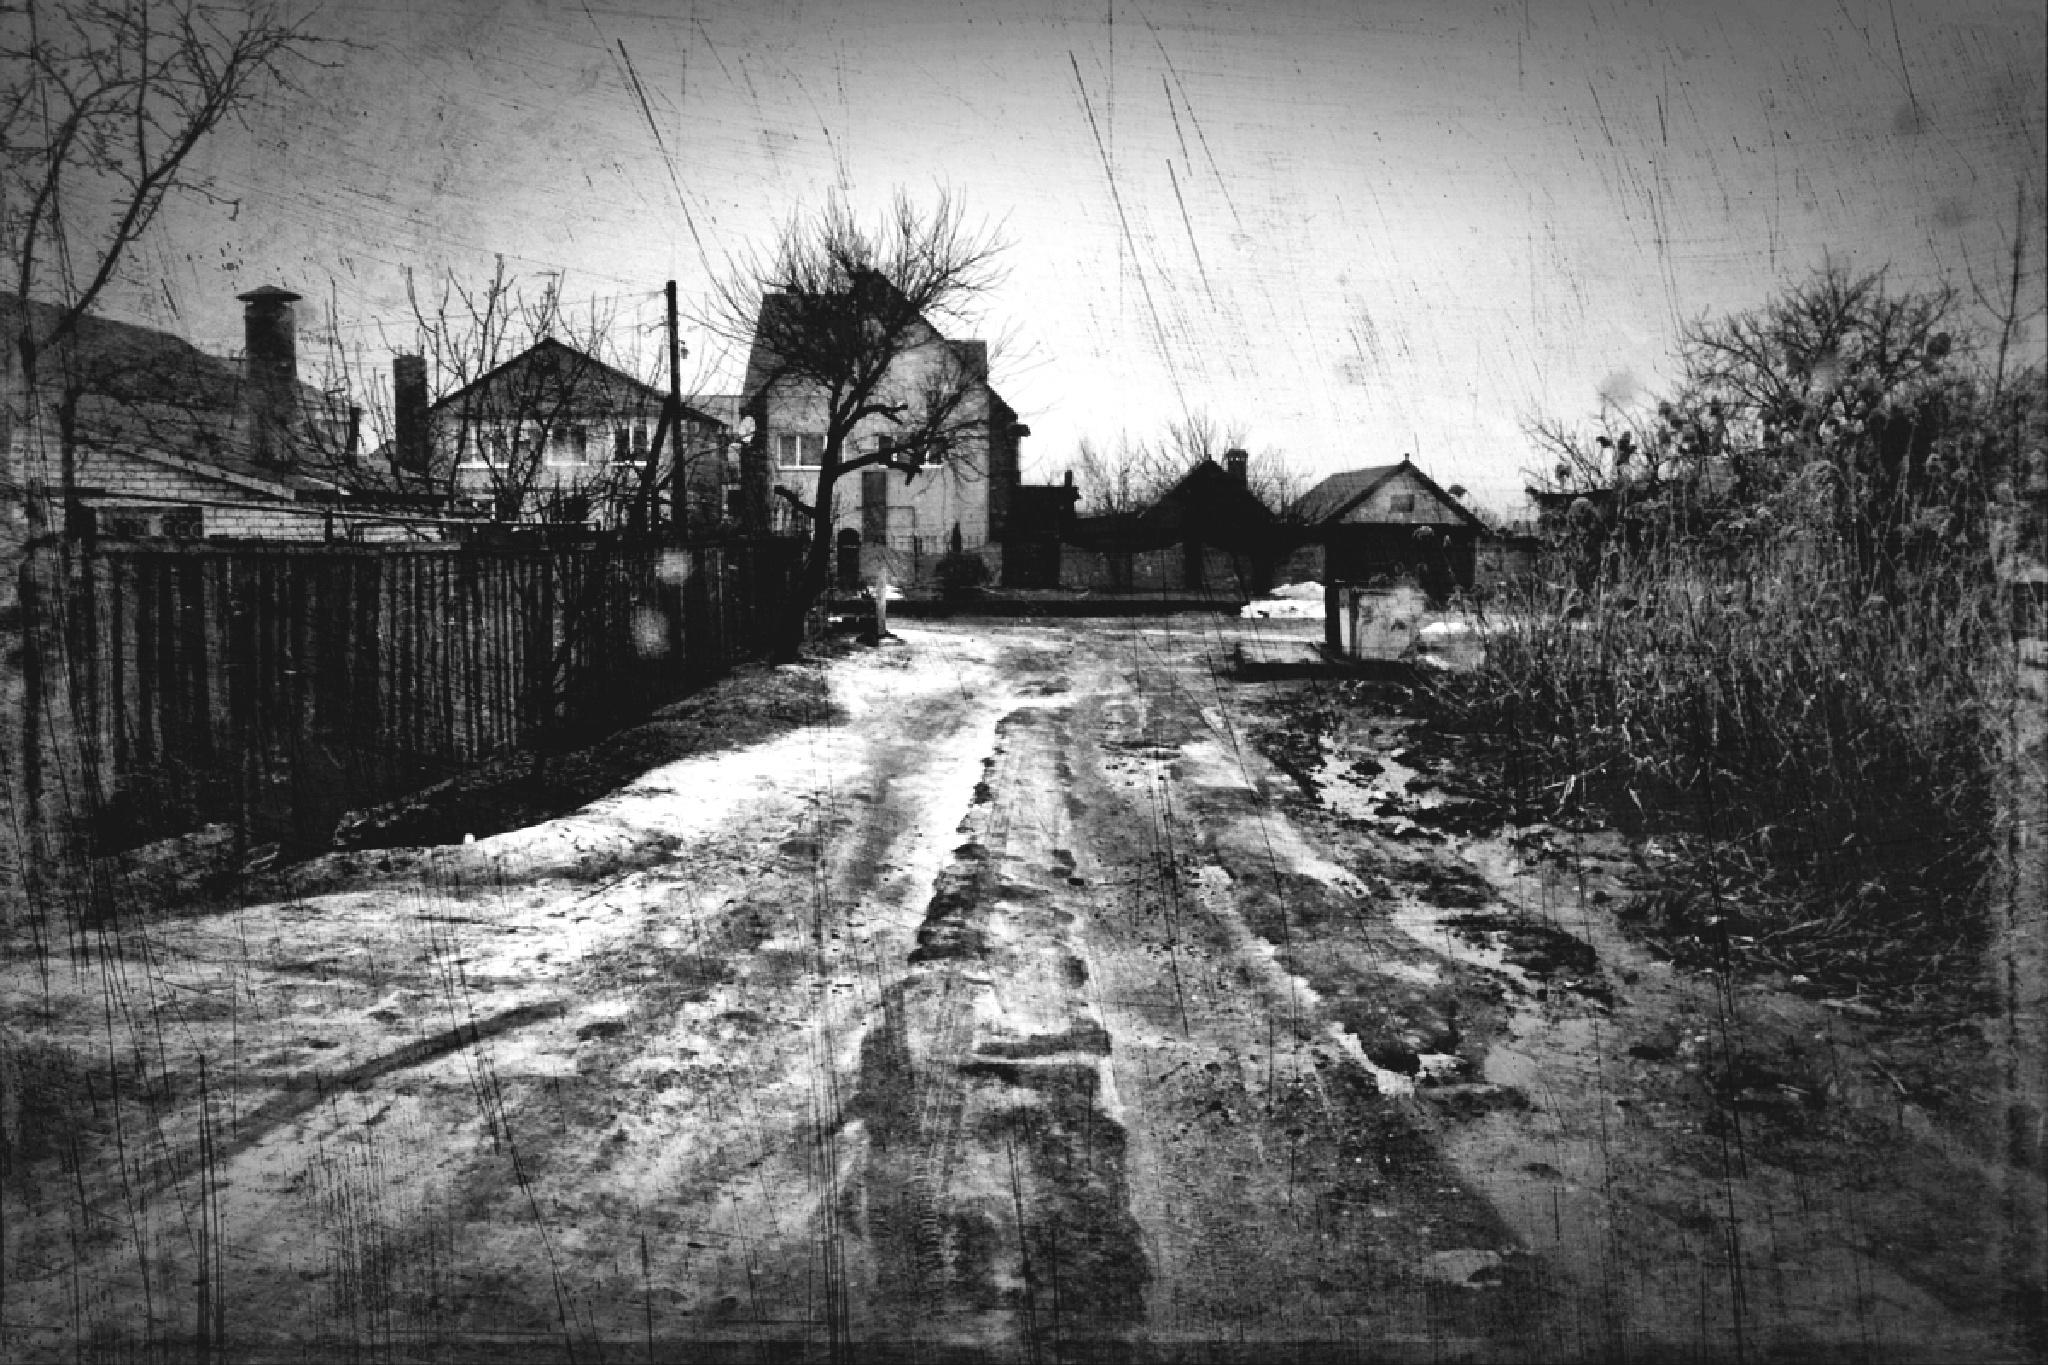 season of bad roads by Bobbyus